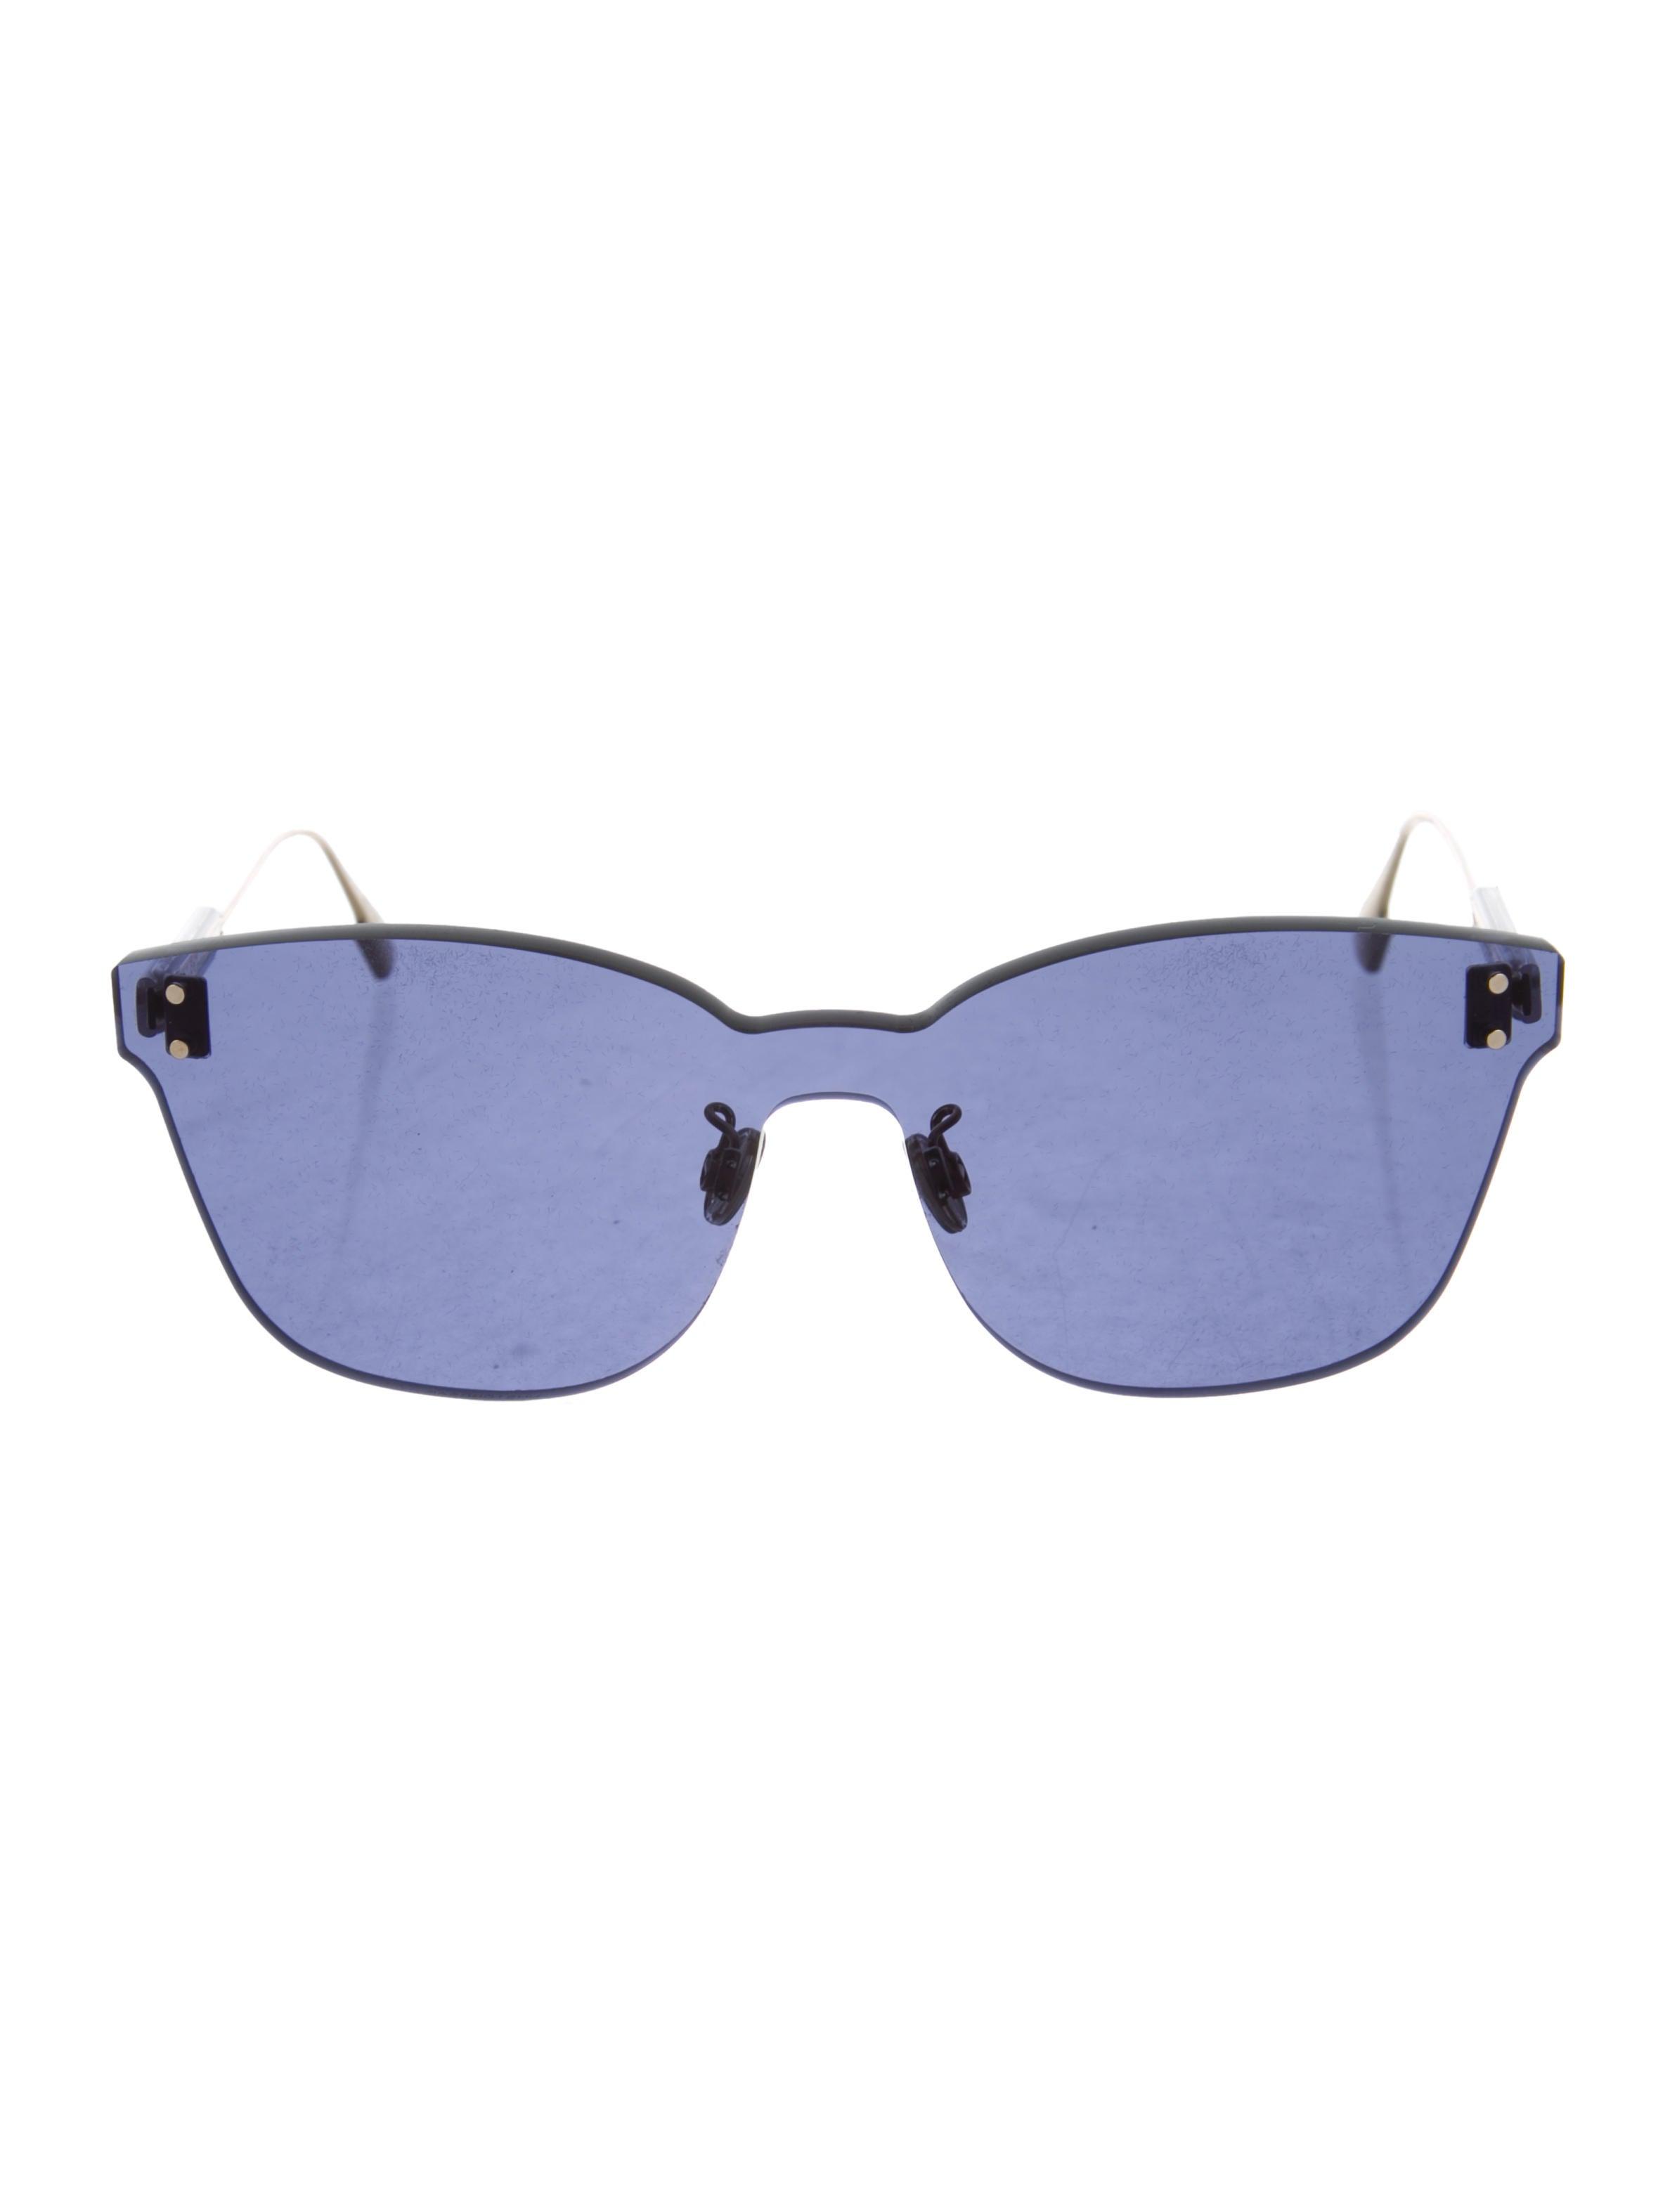 818b23ae3426e Christian Dior Color Quake 2 Sunglasses - Accessories - CHR83599 ...